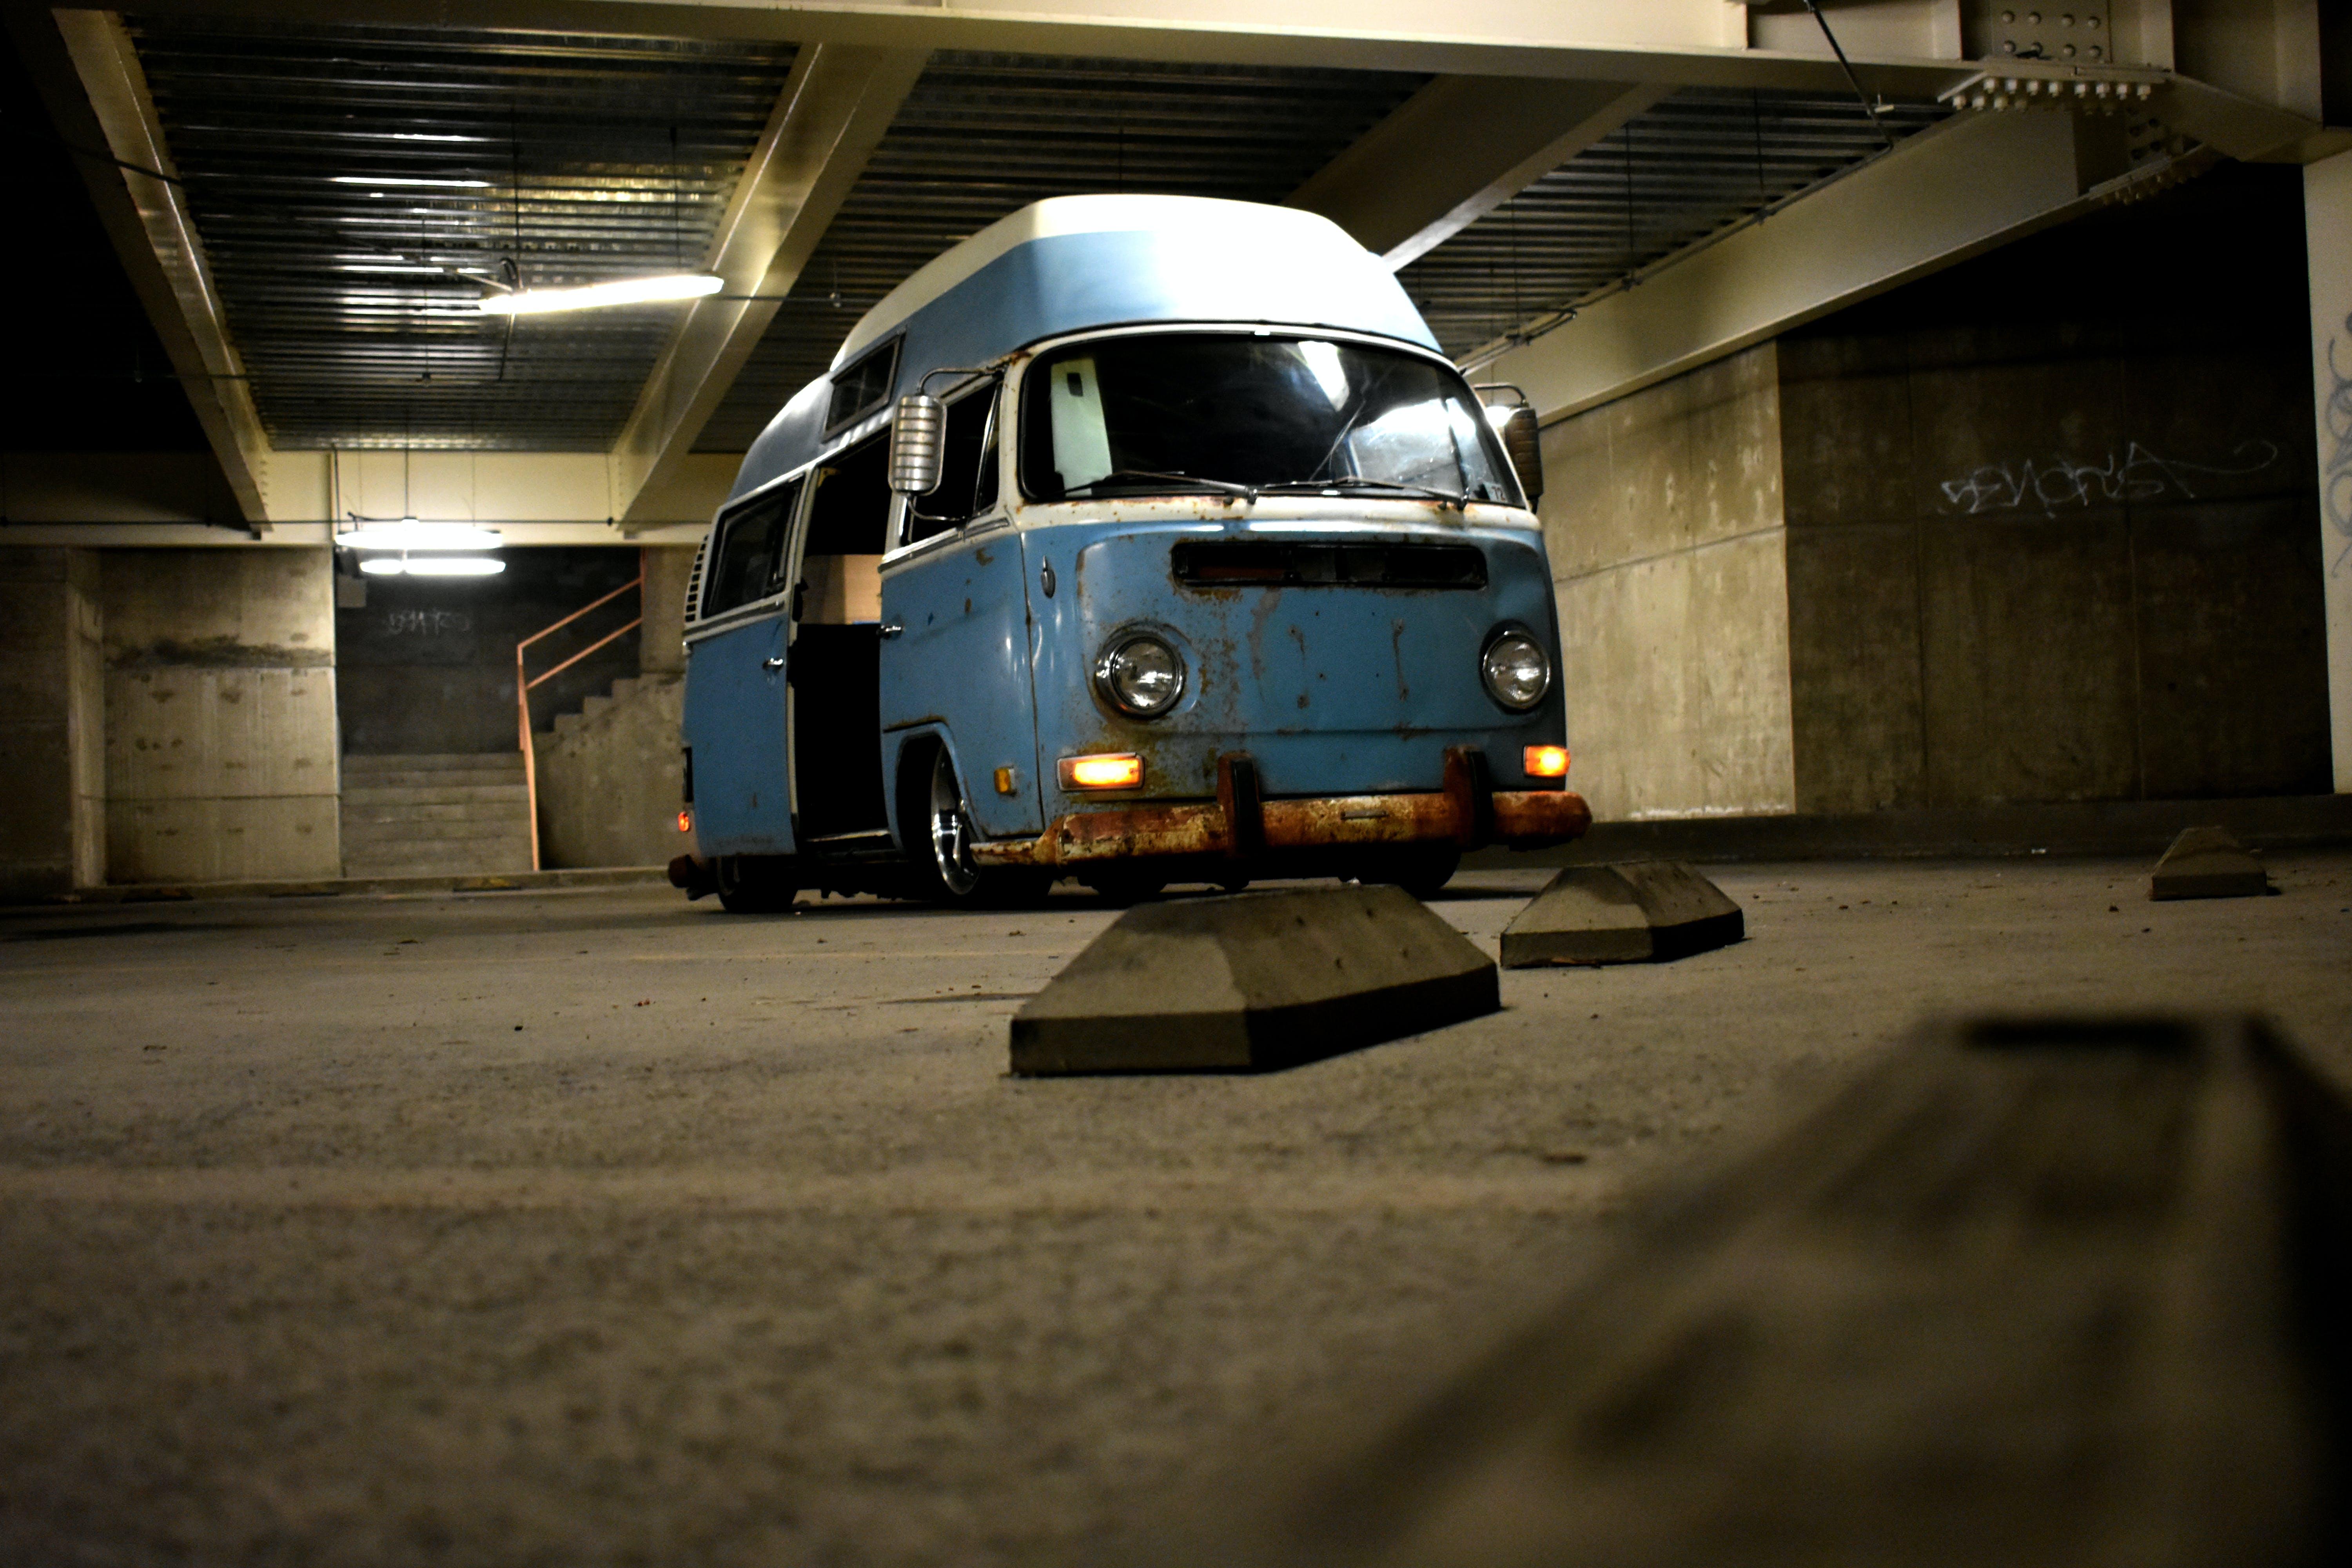 Free stock photo of camping, volkswagen, bumps, hightop